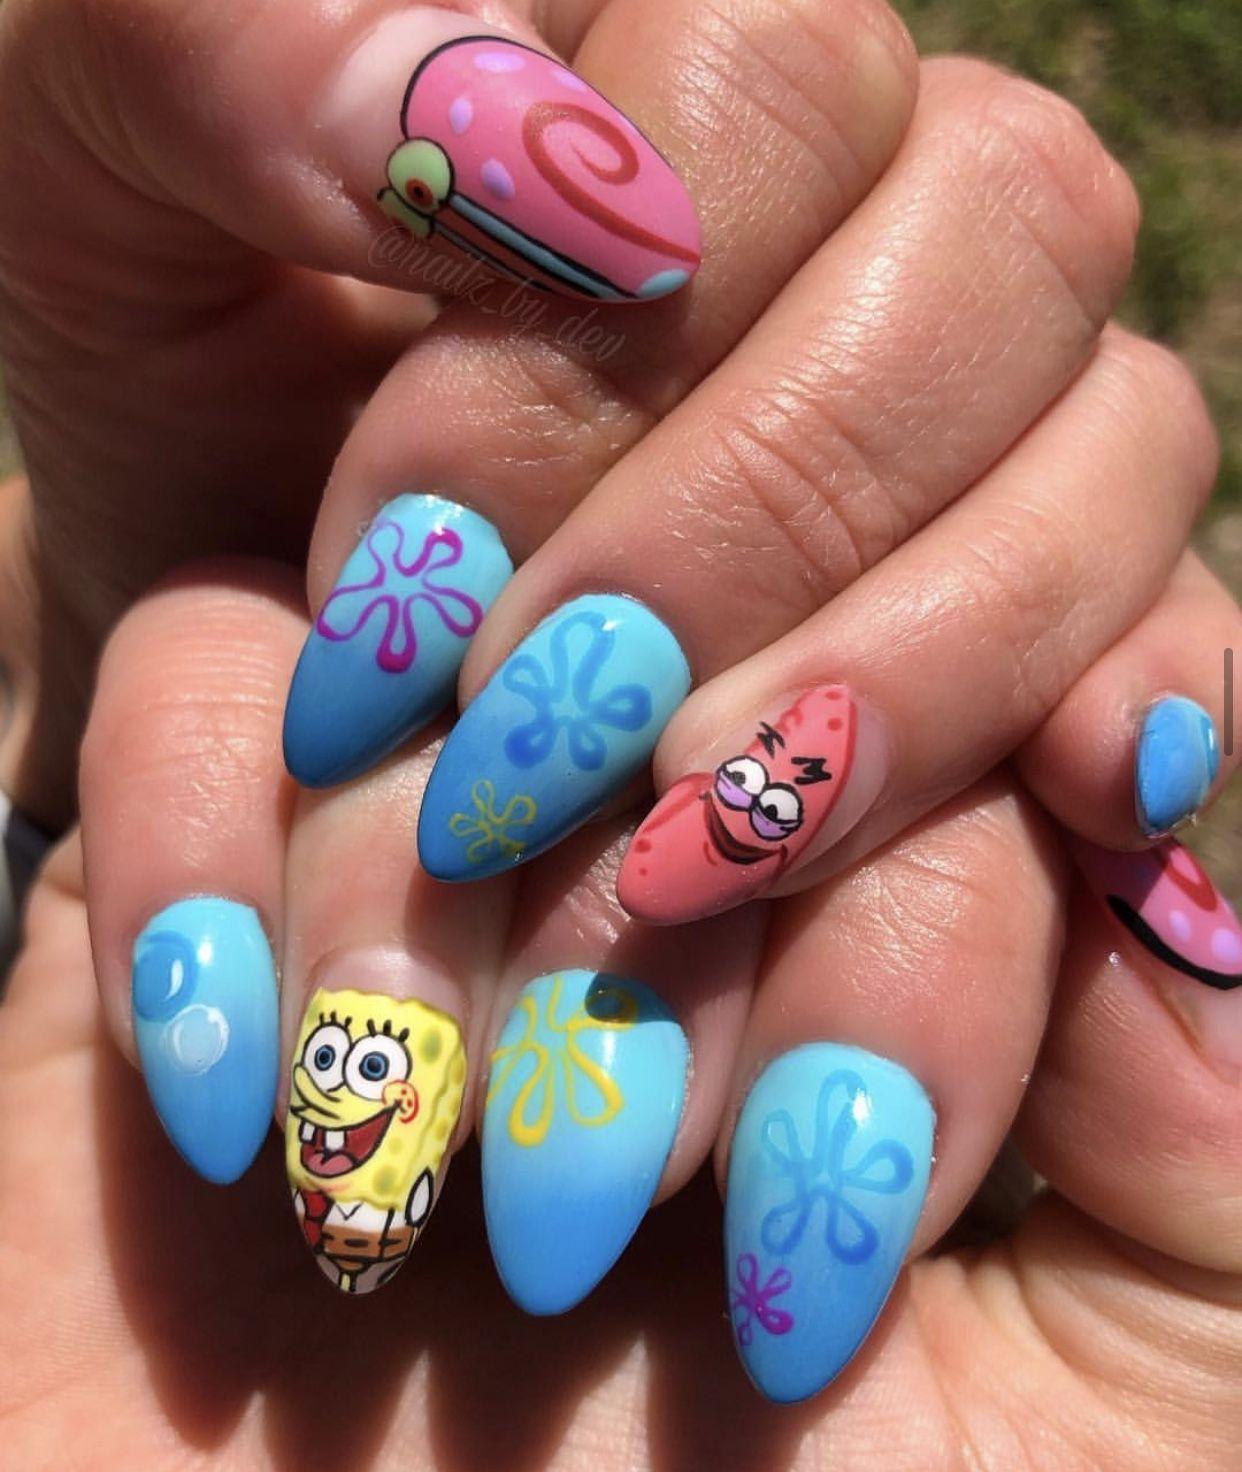 Pin By Bbln On Nails In 2020 Lily Nails Spongebob Nails Disney Acrylic Nails